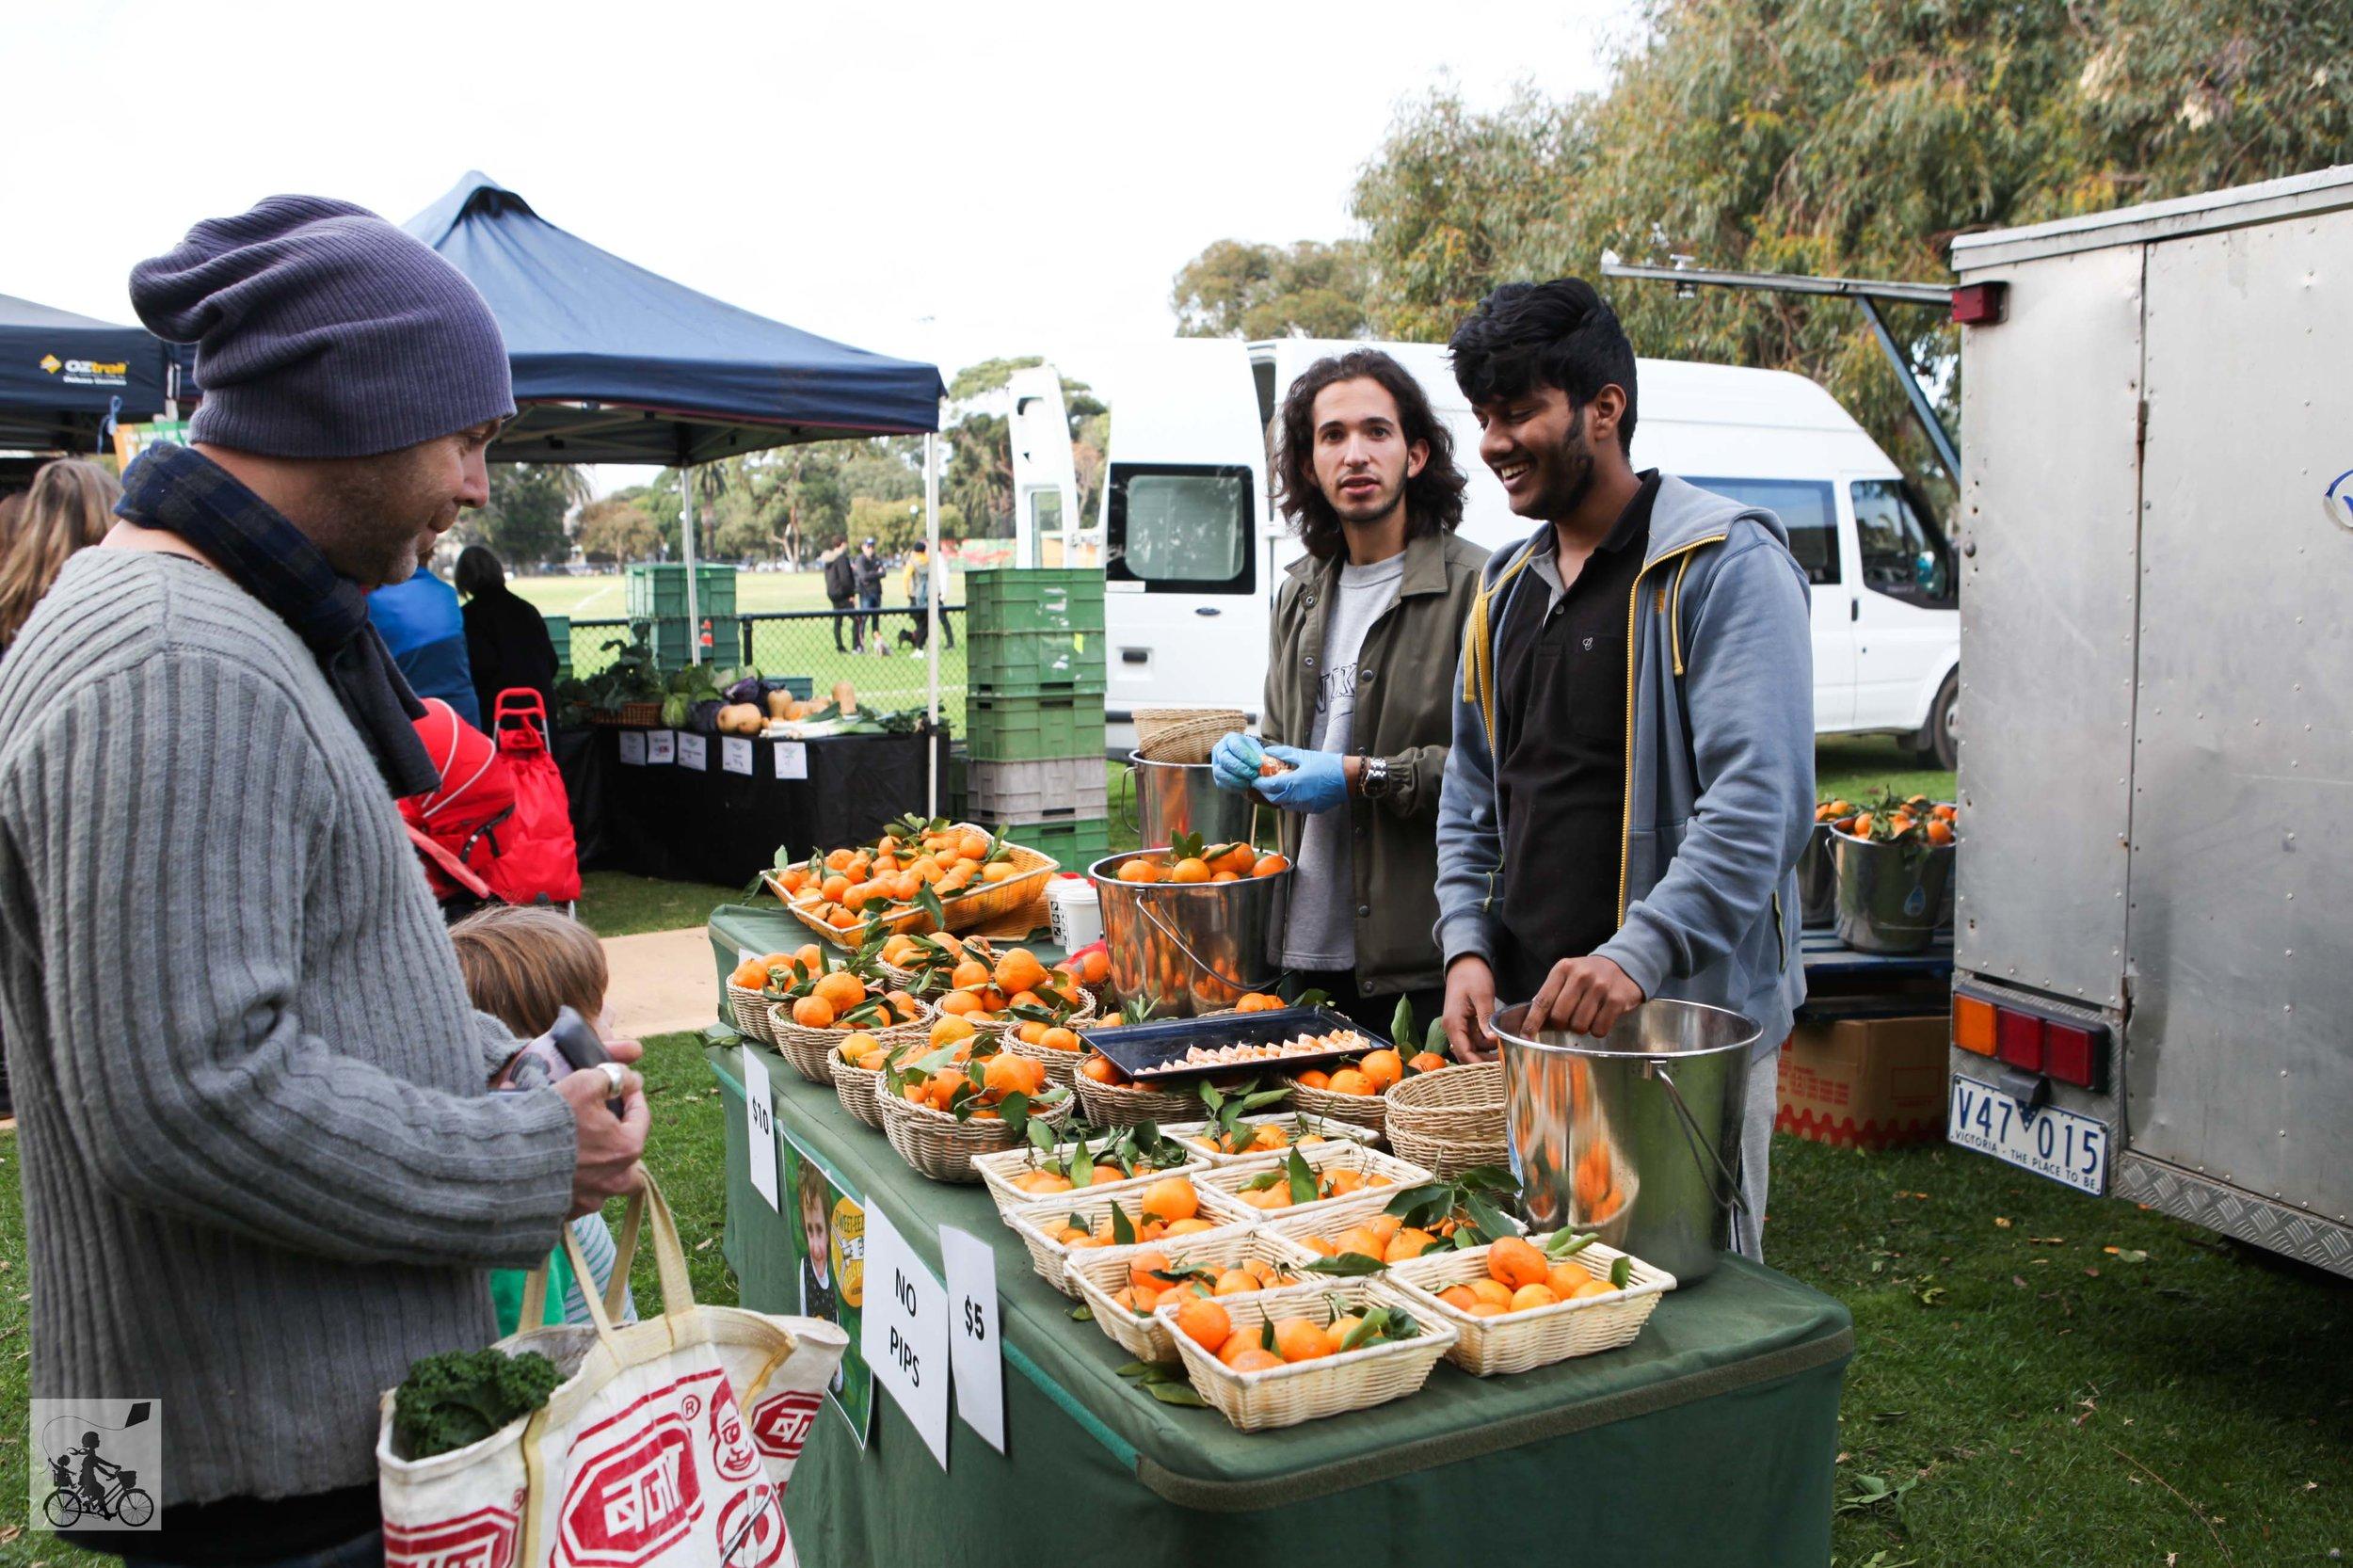 veg out market, st kilda